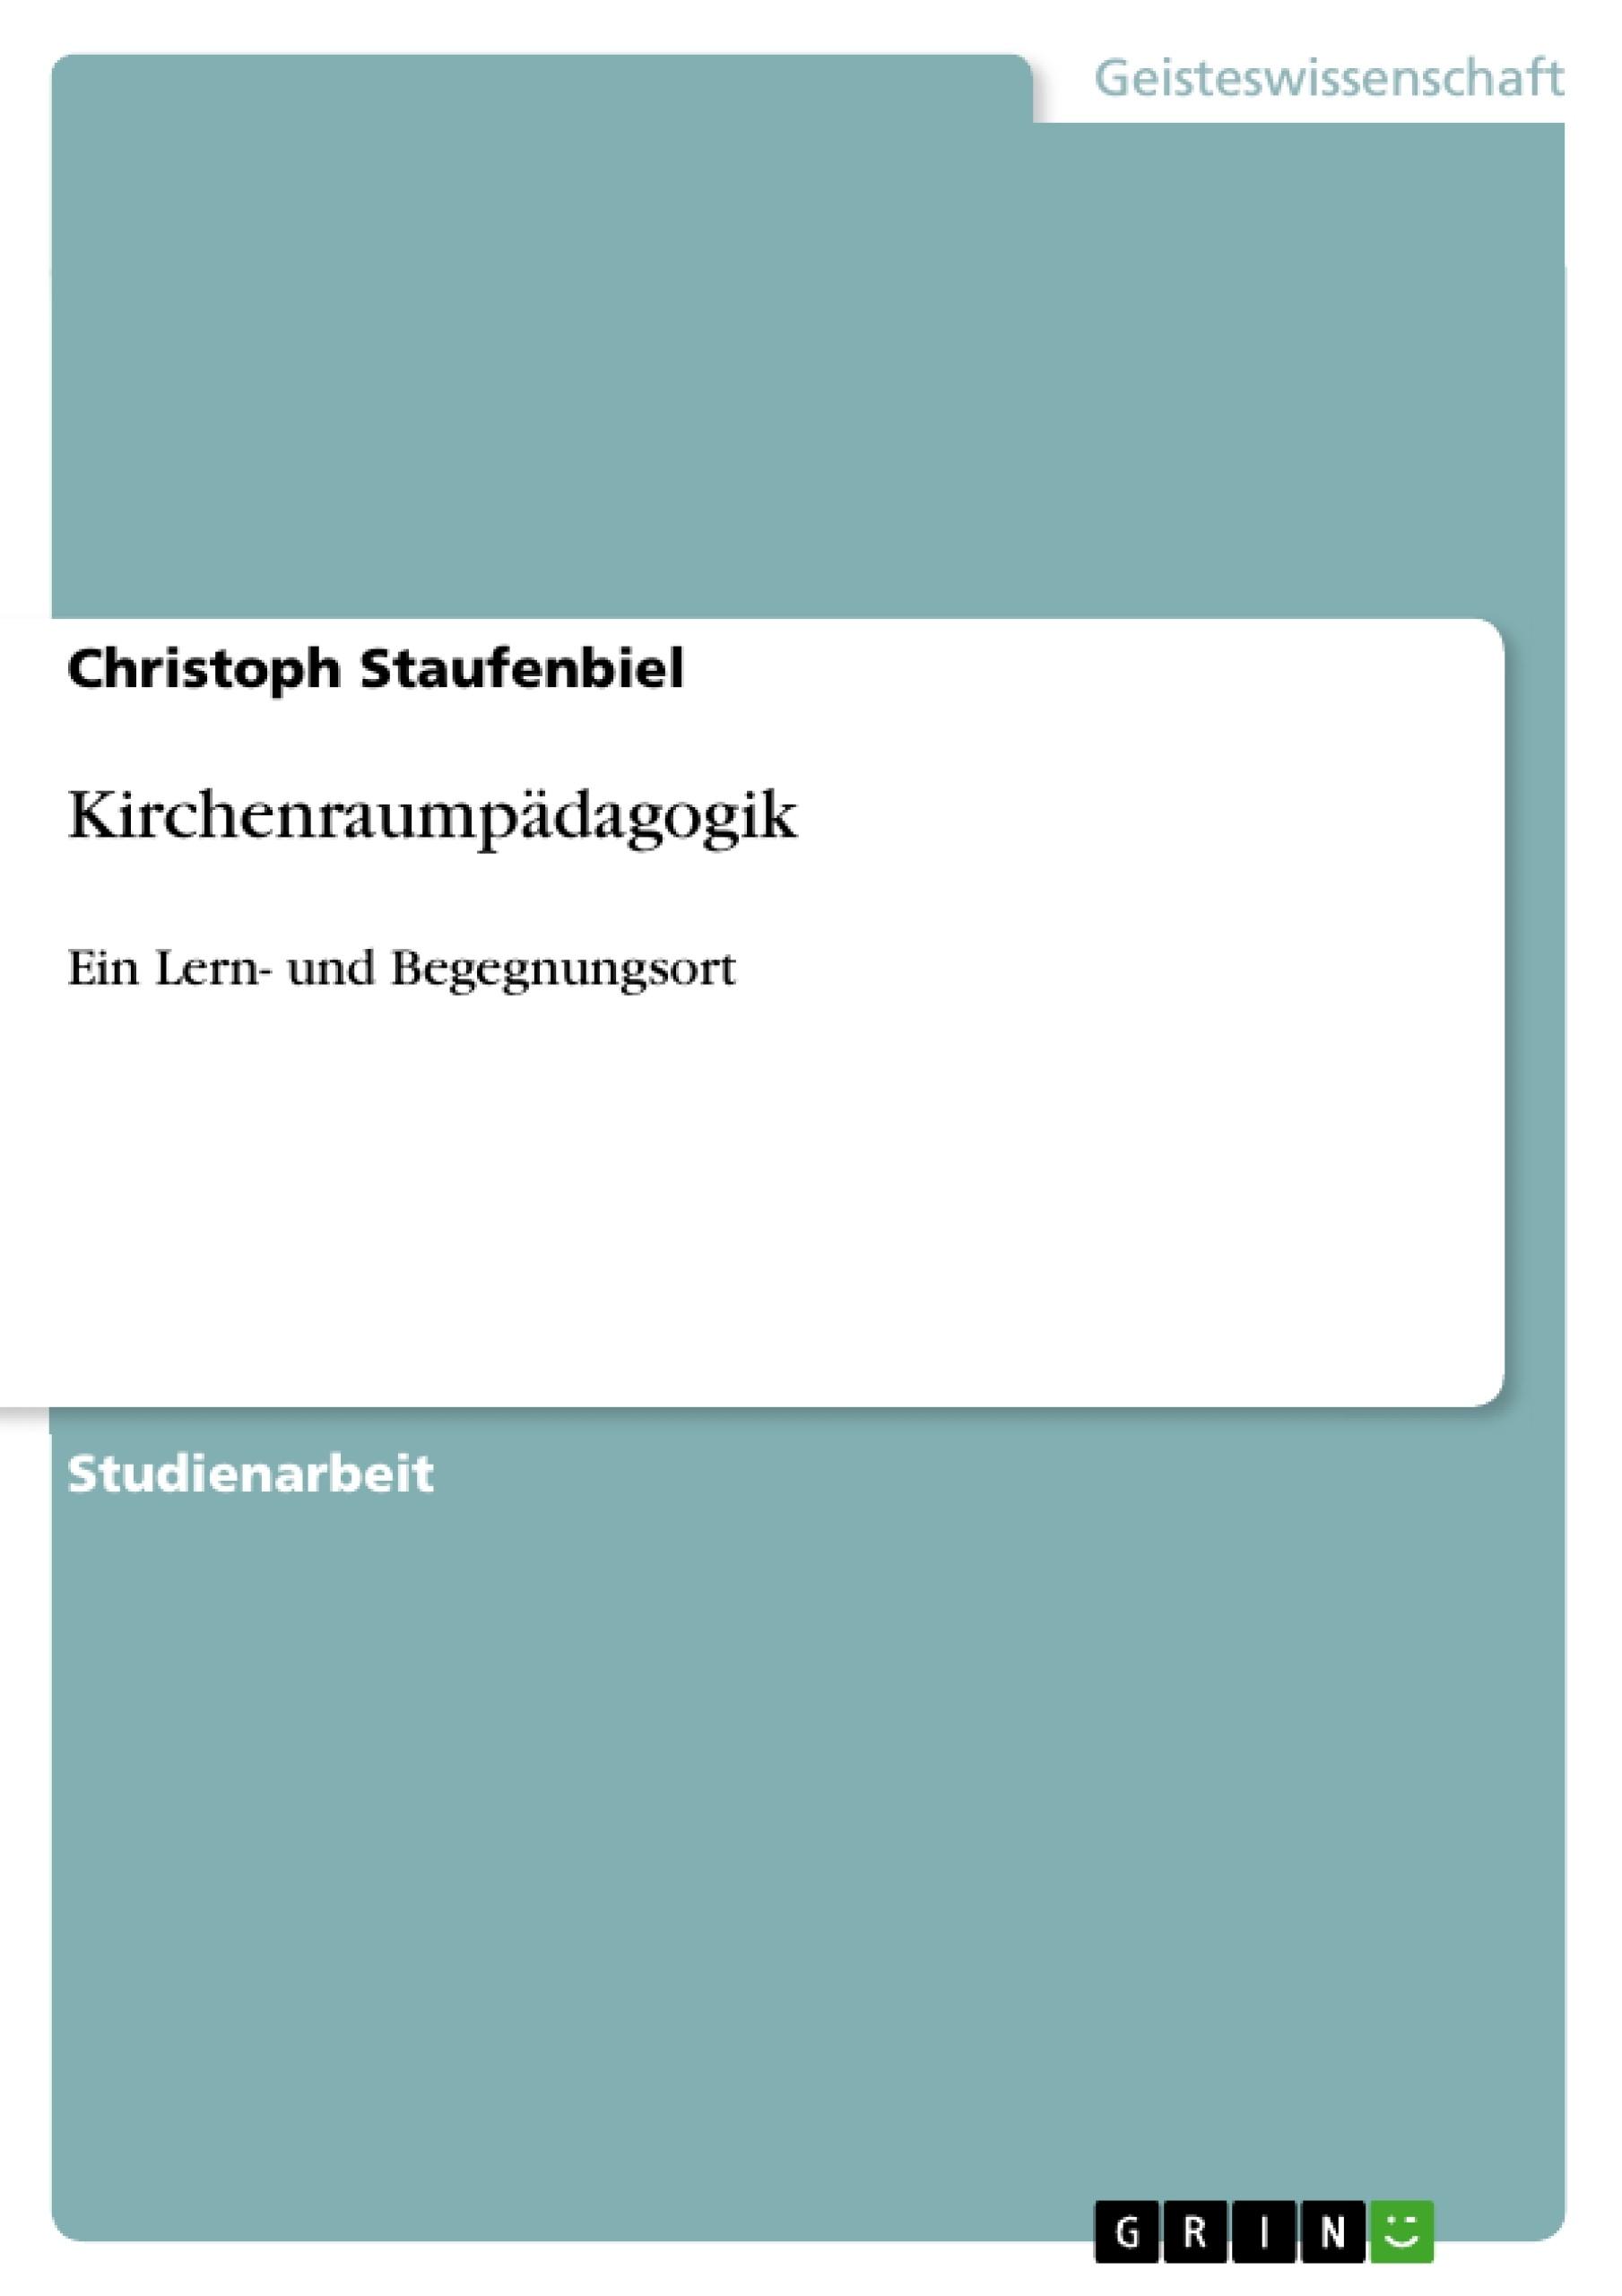 Titel: Kirchenraumpädagogik